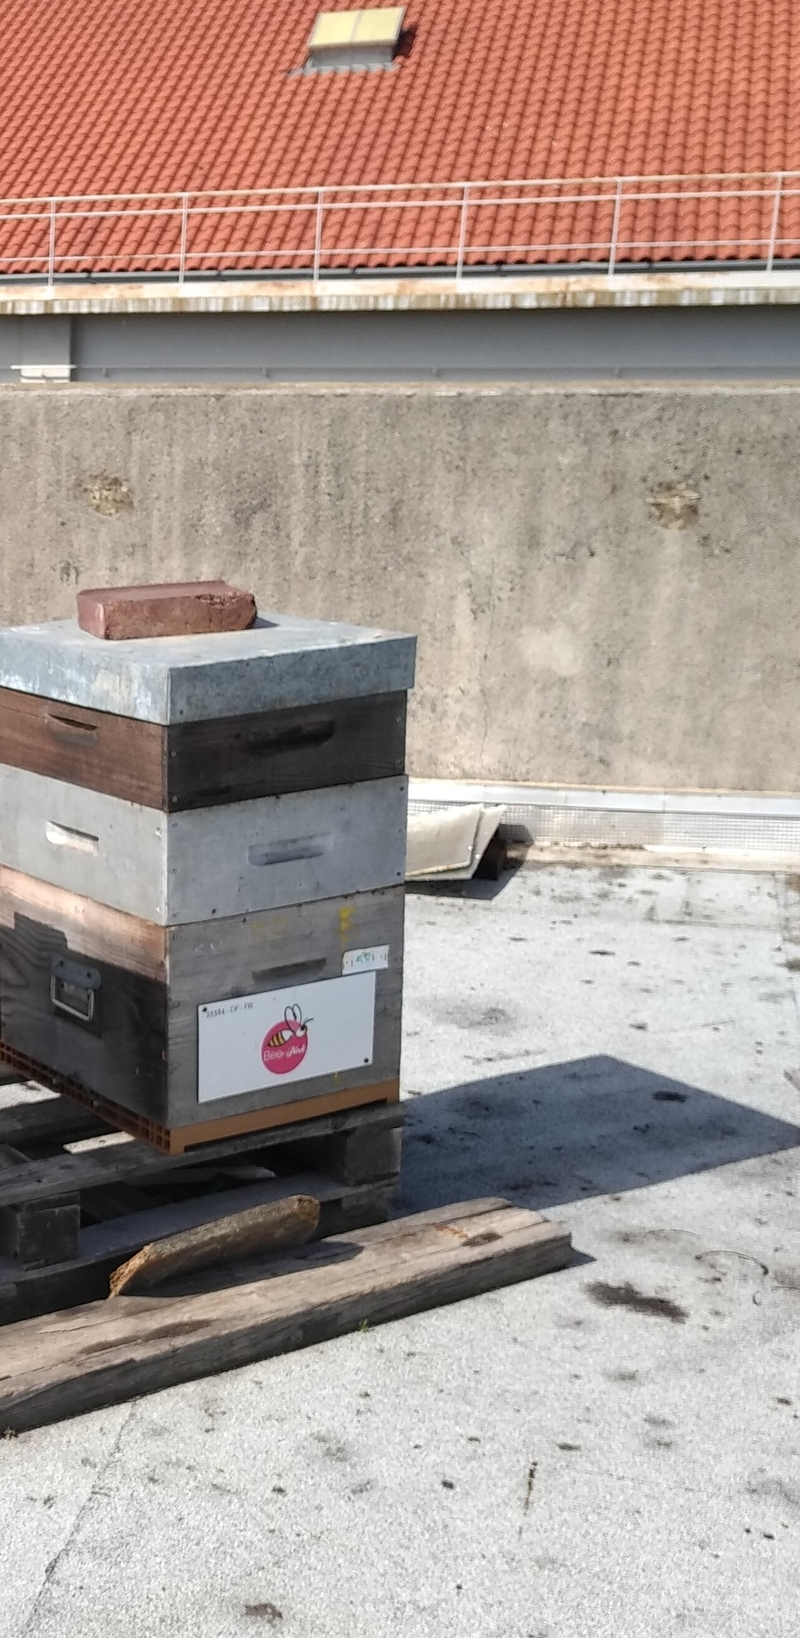 La ruche PINK LADY